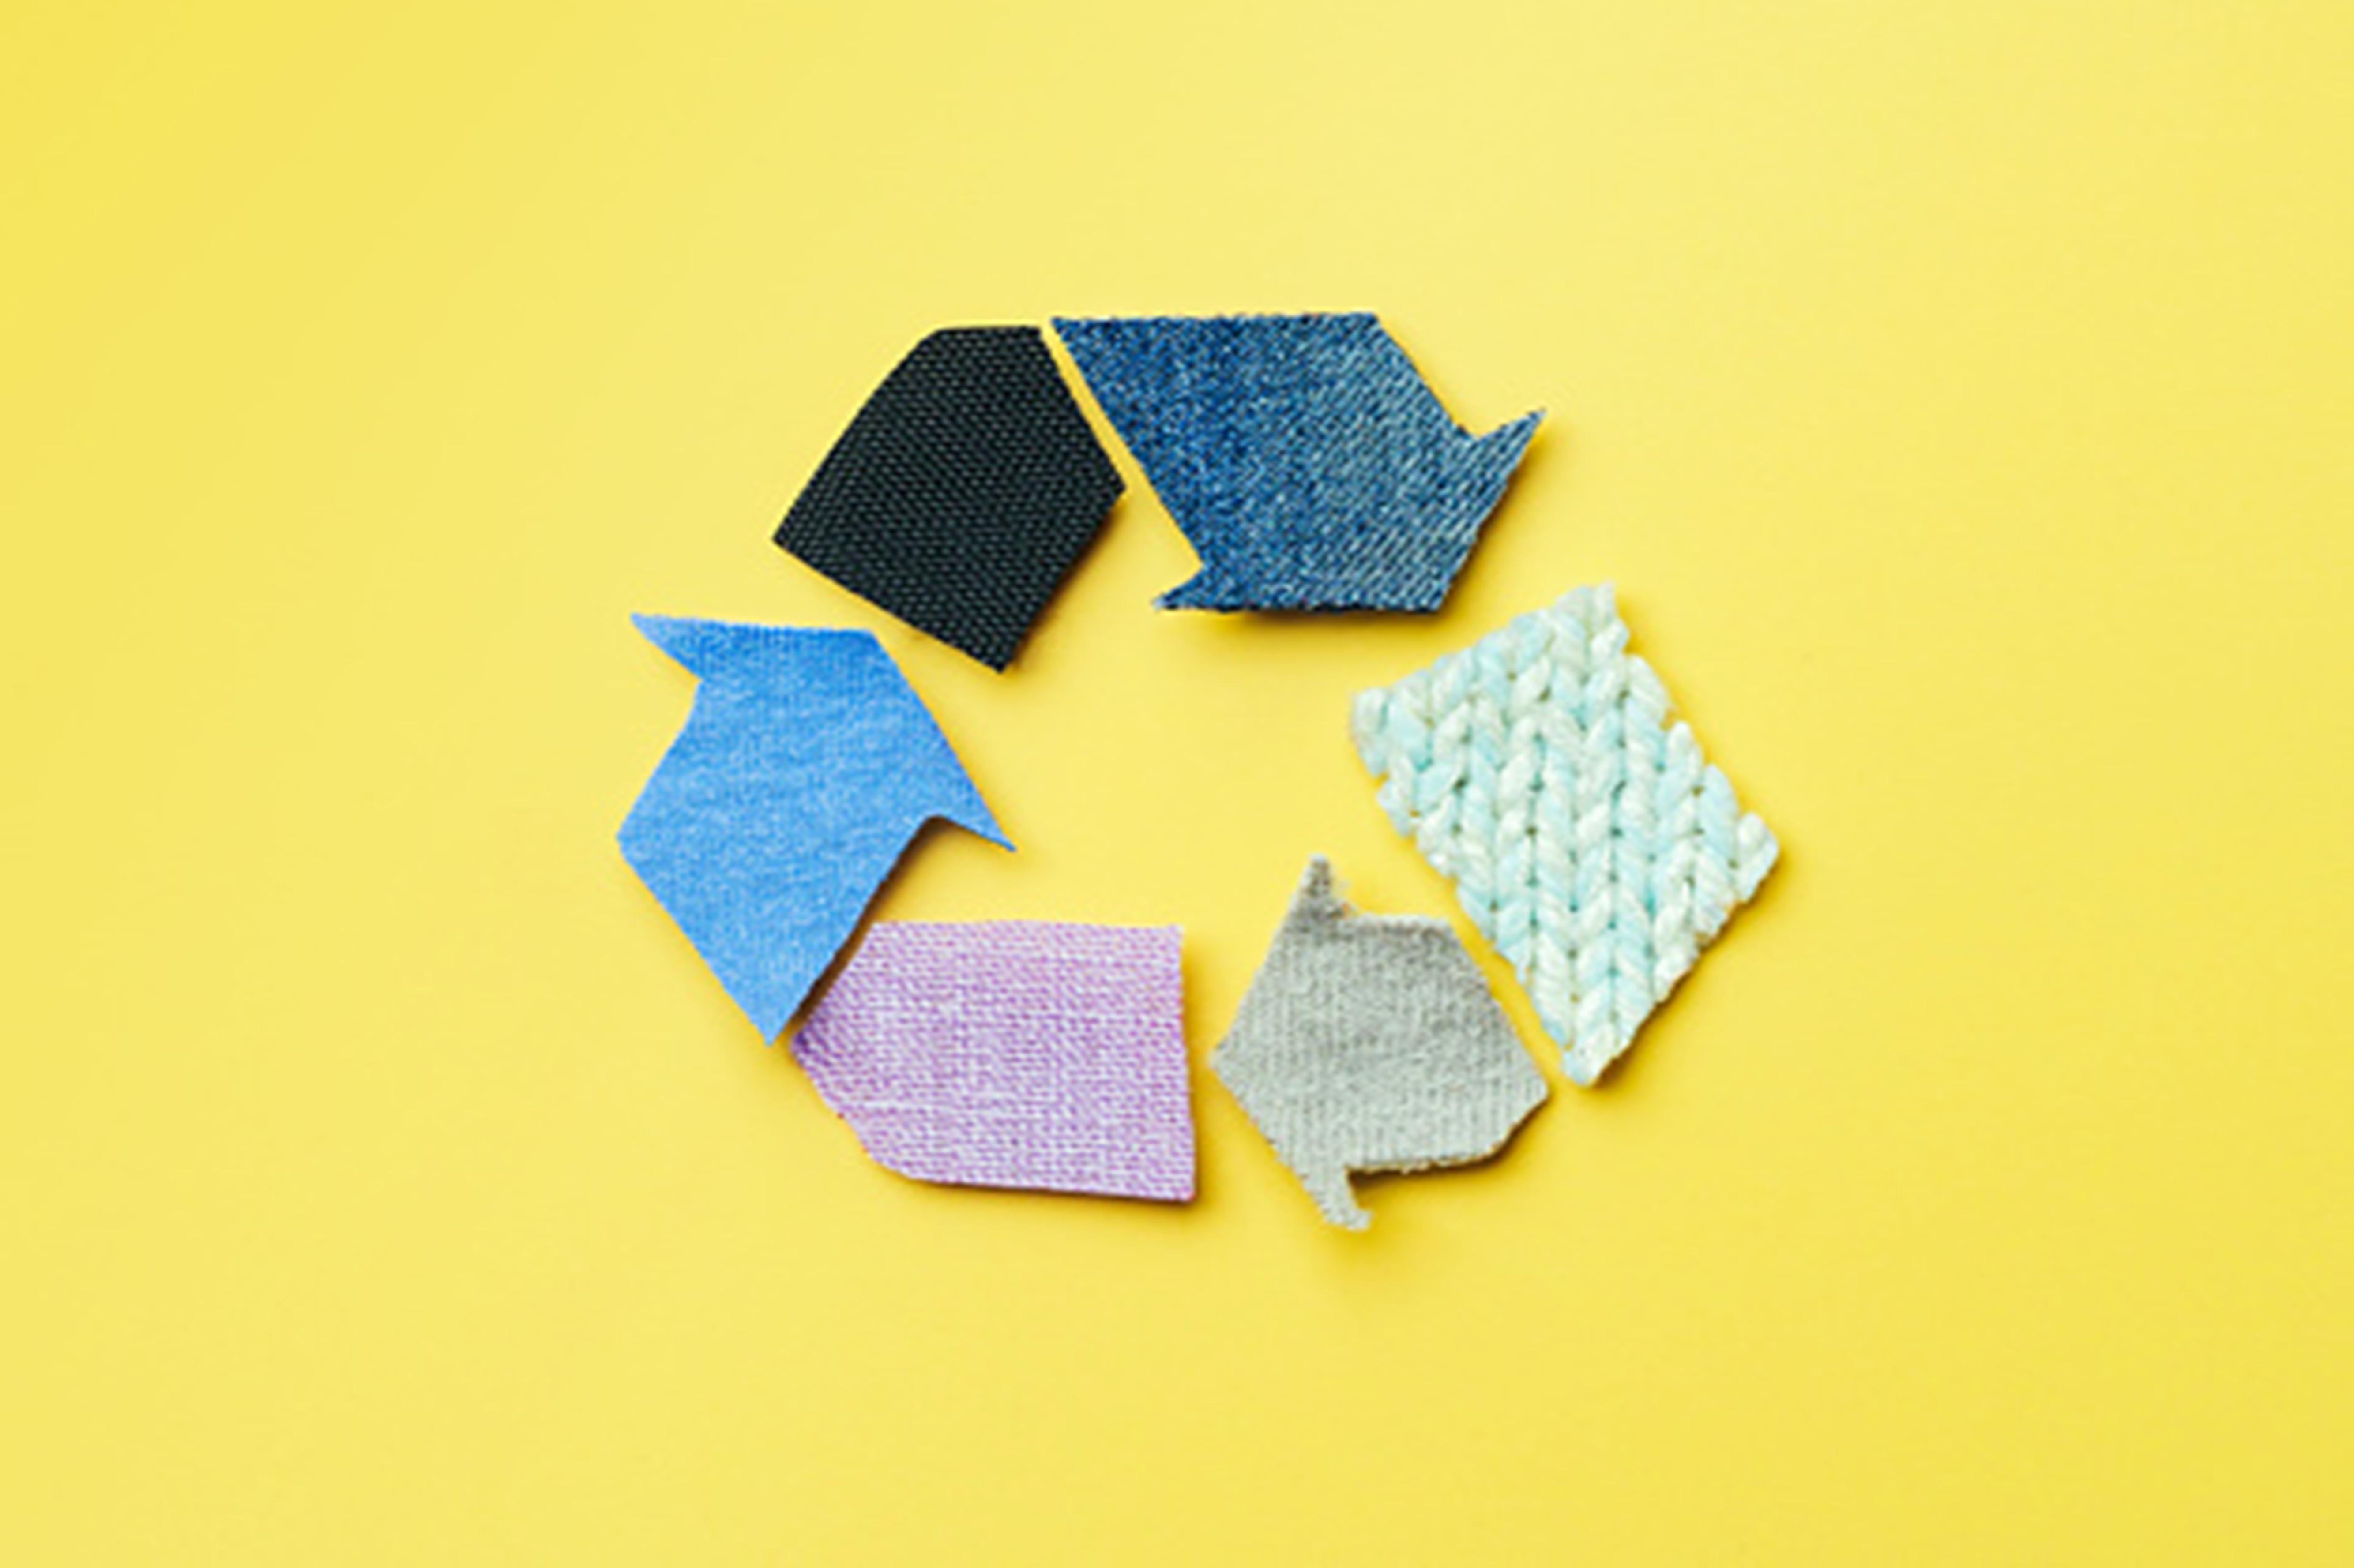 Sustainable development of clothing